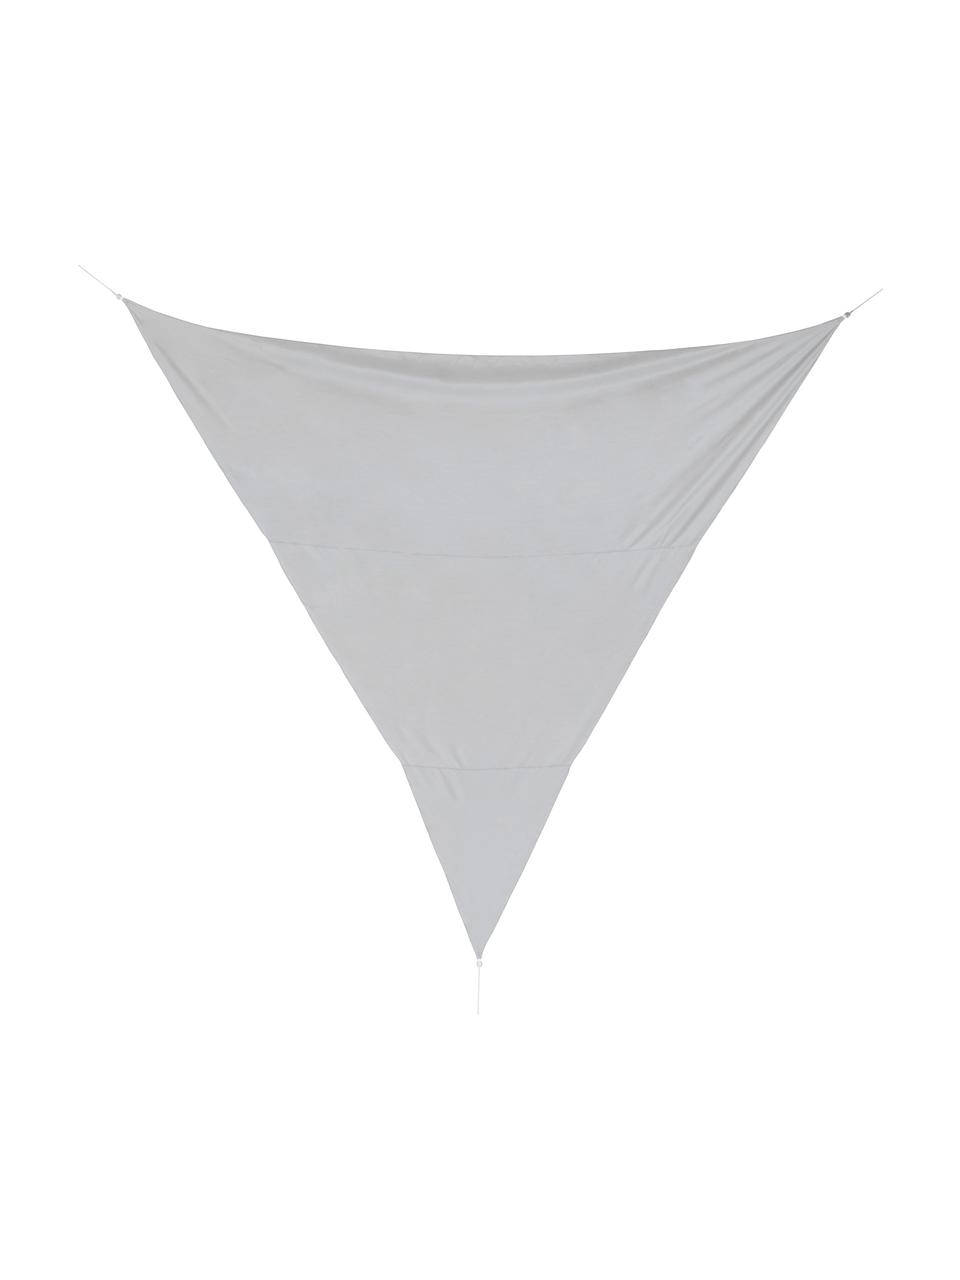 Graues Sonnensegel Triangle, Grau, 500 x 500 cm